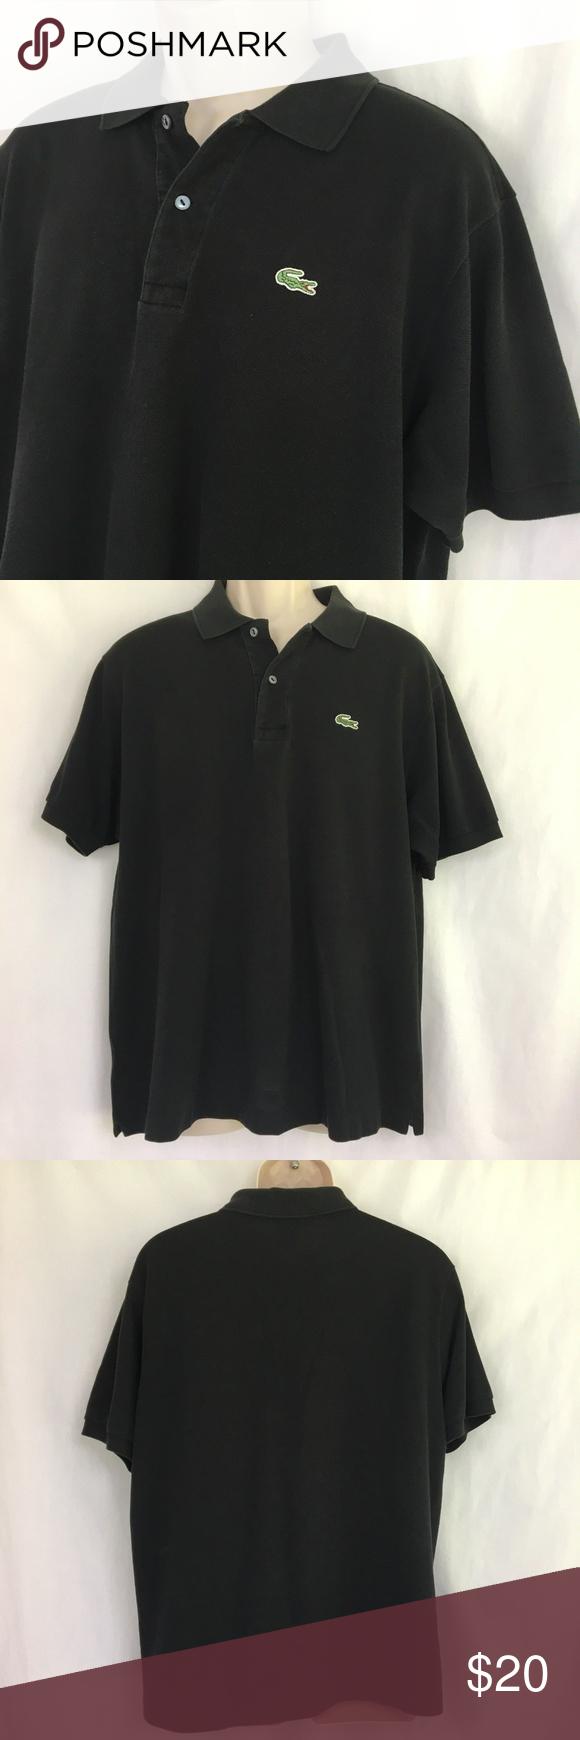 9f71e6e71 Vintage Izod Lacoste Alligator Men s Polo Shirt Vintage Izod Lacoste  Alligator Men s Polo Shirt Size 6